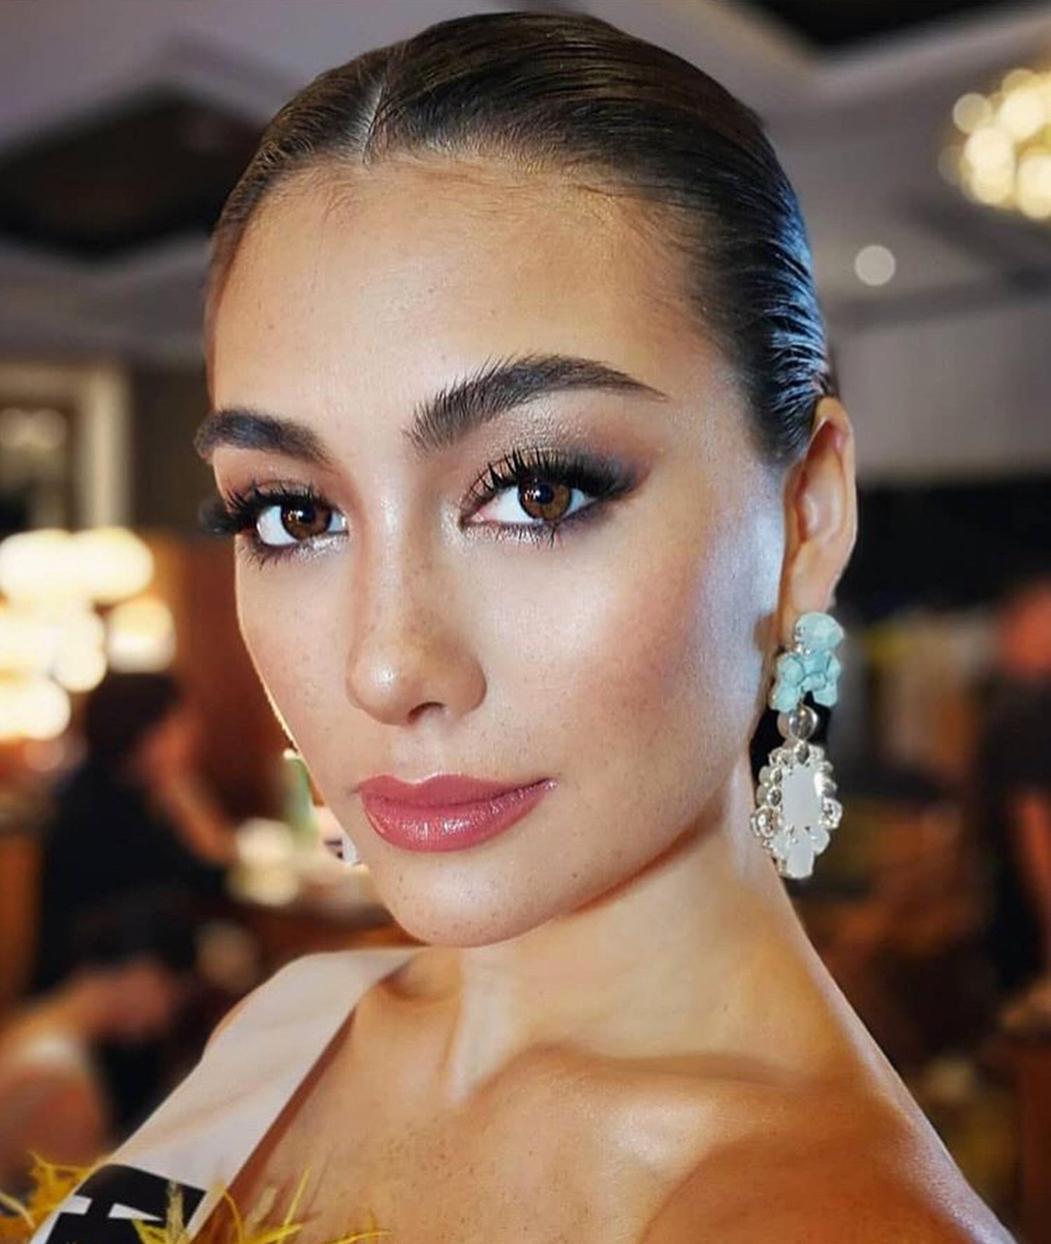 thai night gala dinner de candidatas a miss universe 2018. - Página 11 578rz78x